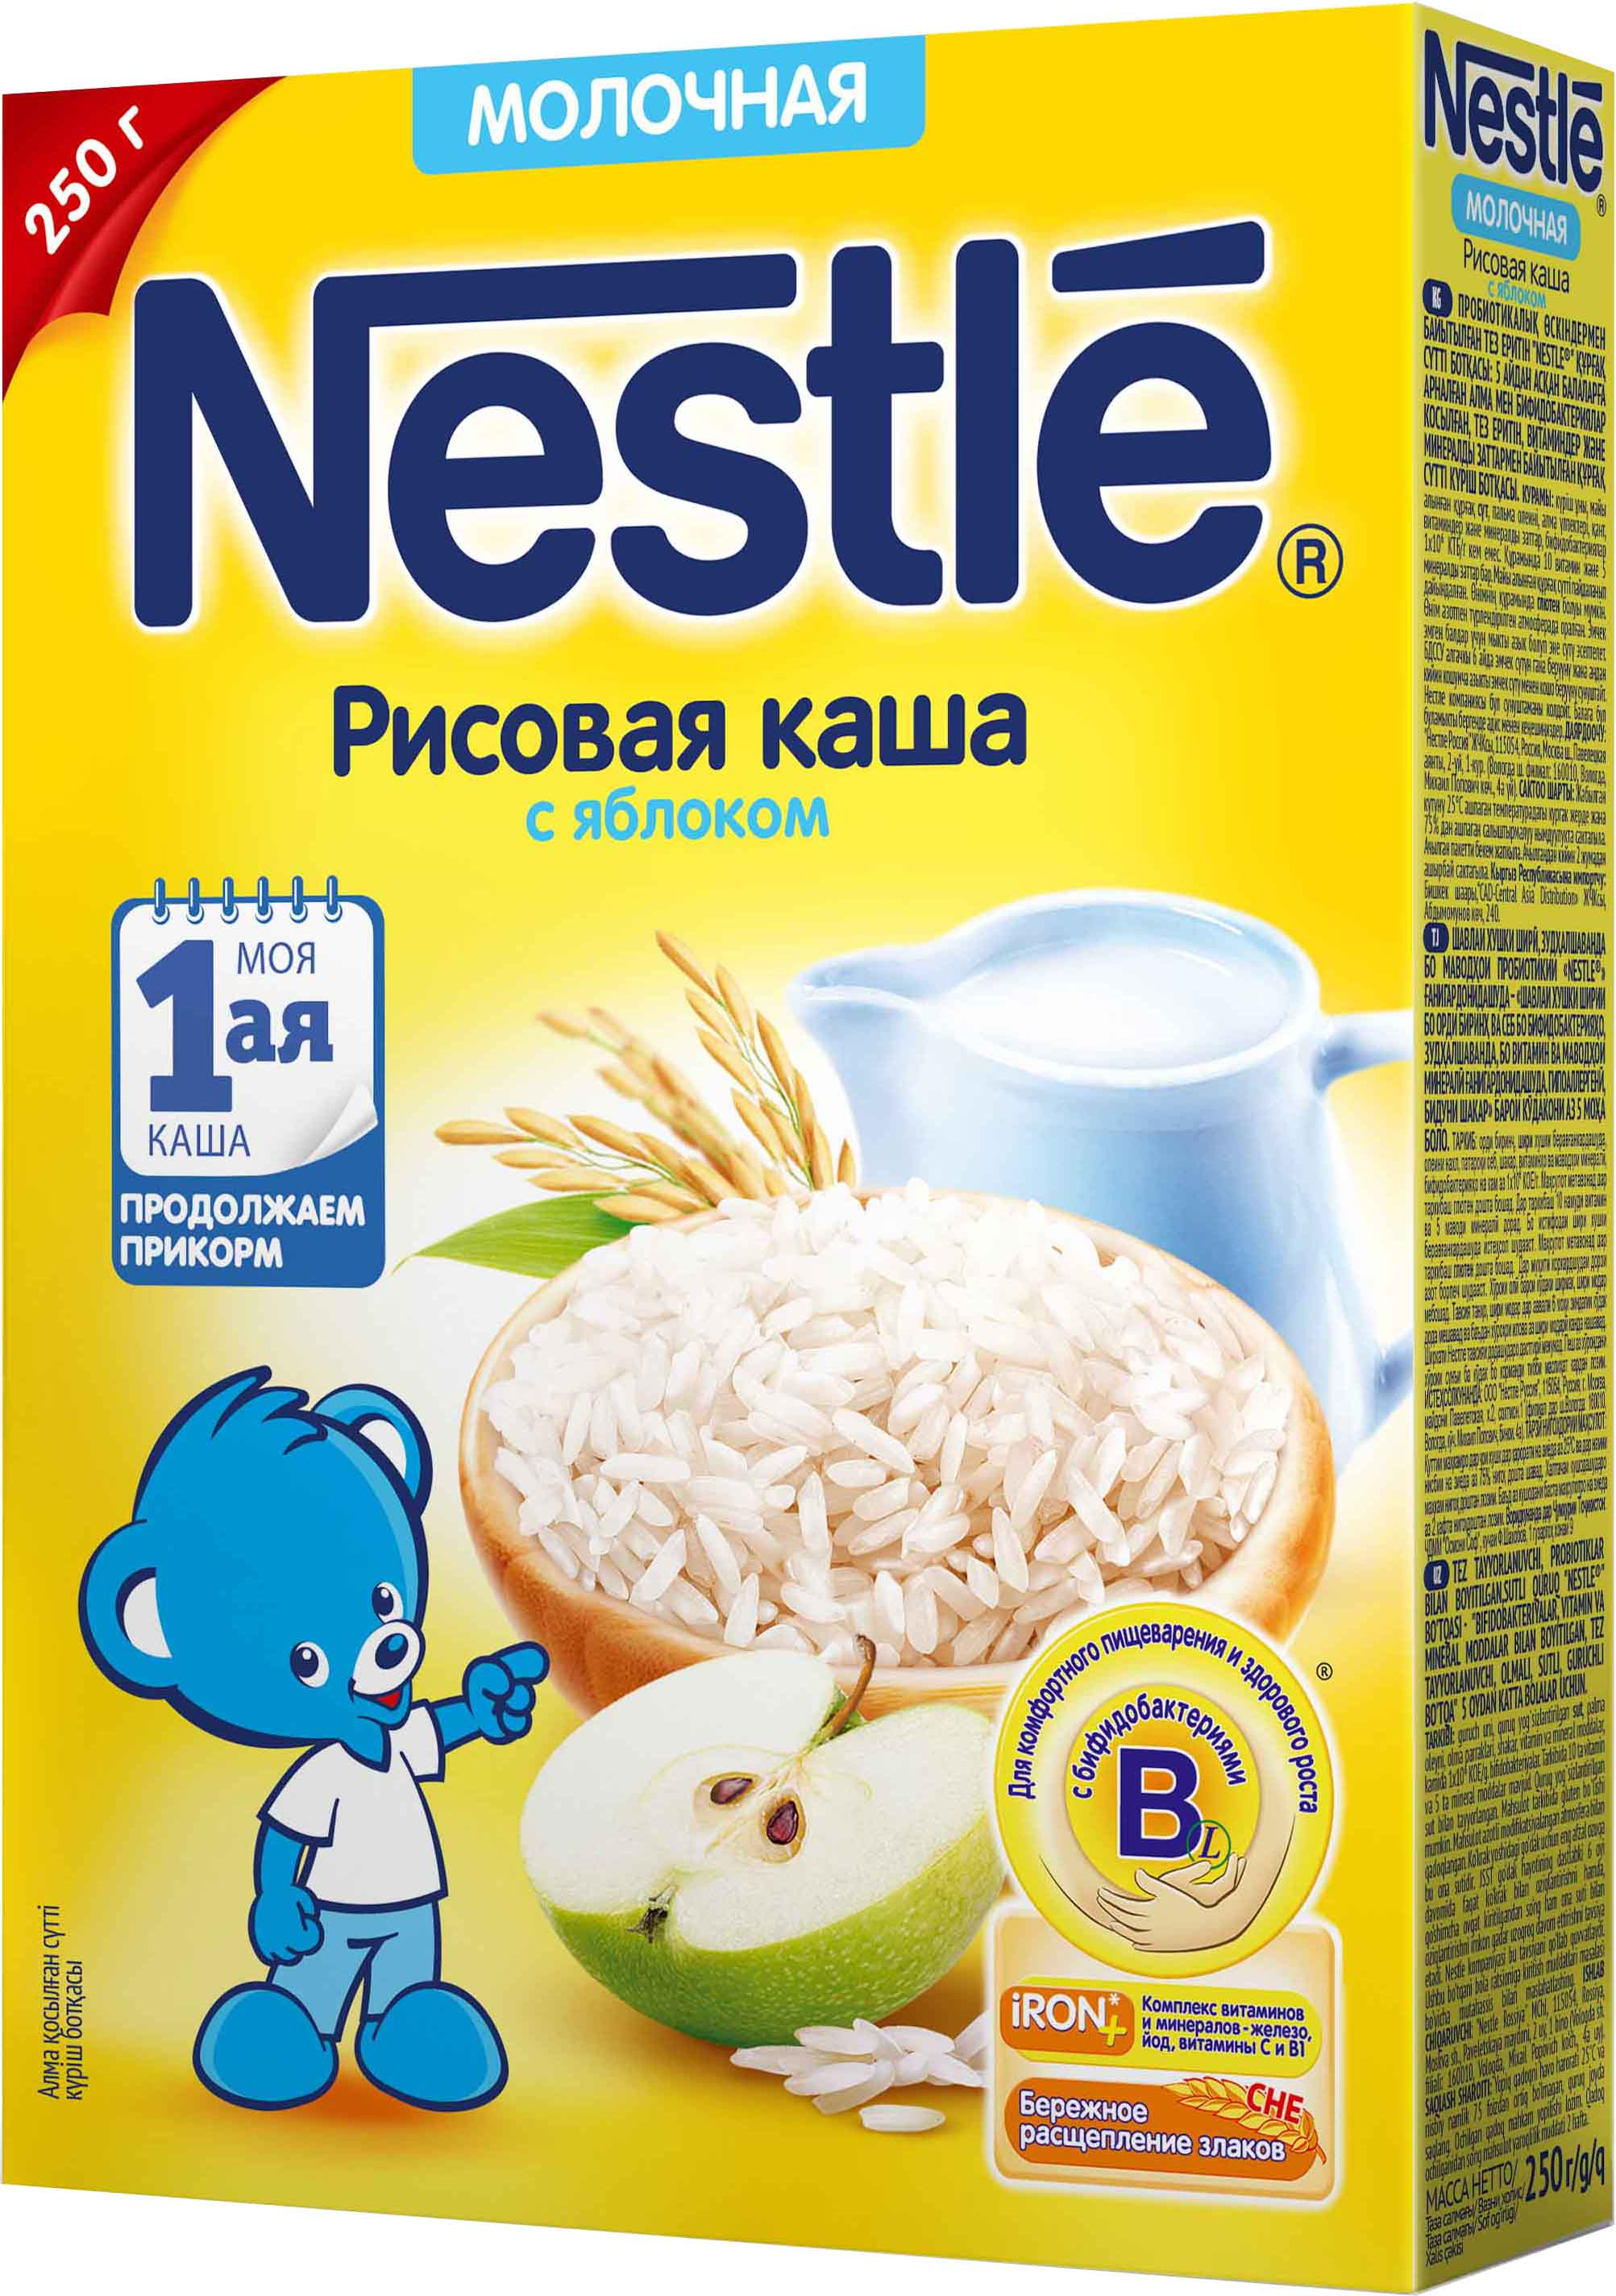 Каша Nestle Nestlé Молочная рисовая с яблоком (с 5 месяцев) 250 г беллакт каша молочная гречневая с яблоком 250 г